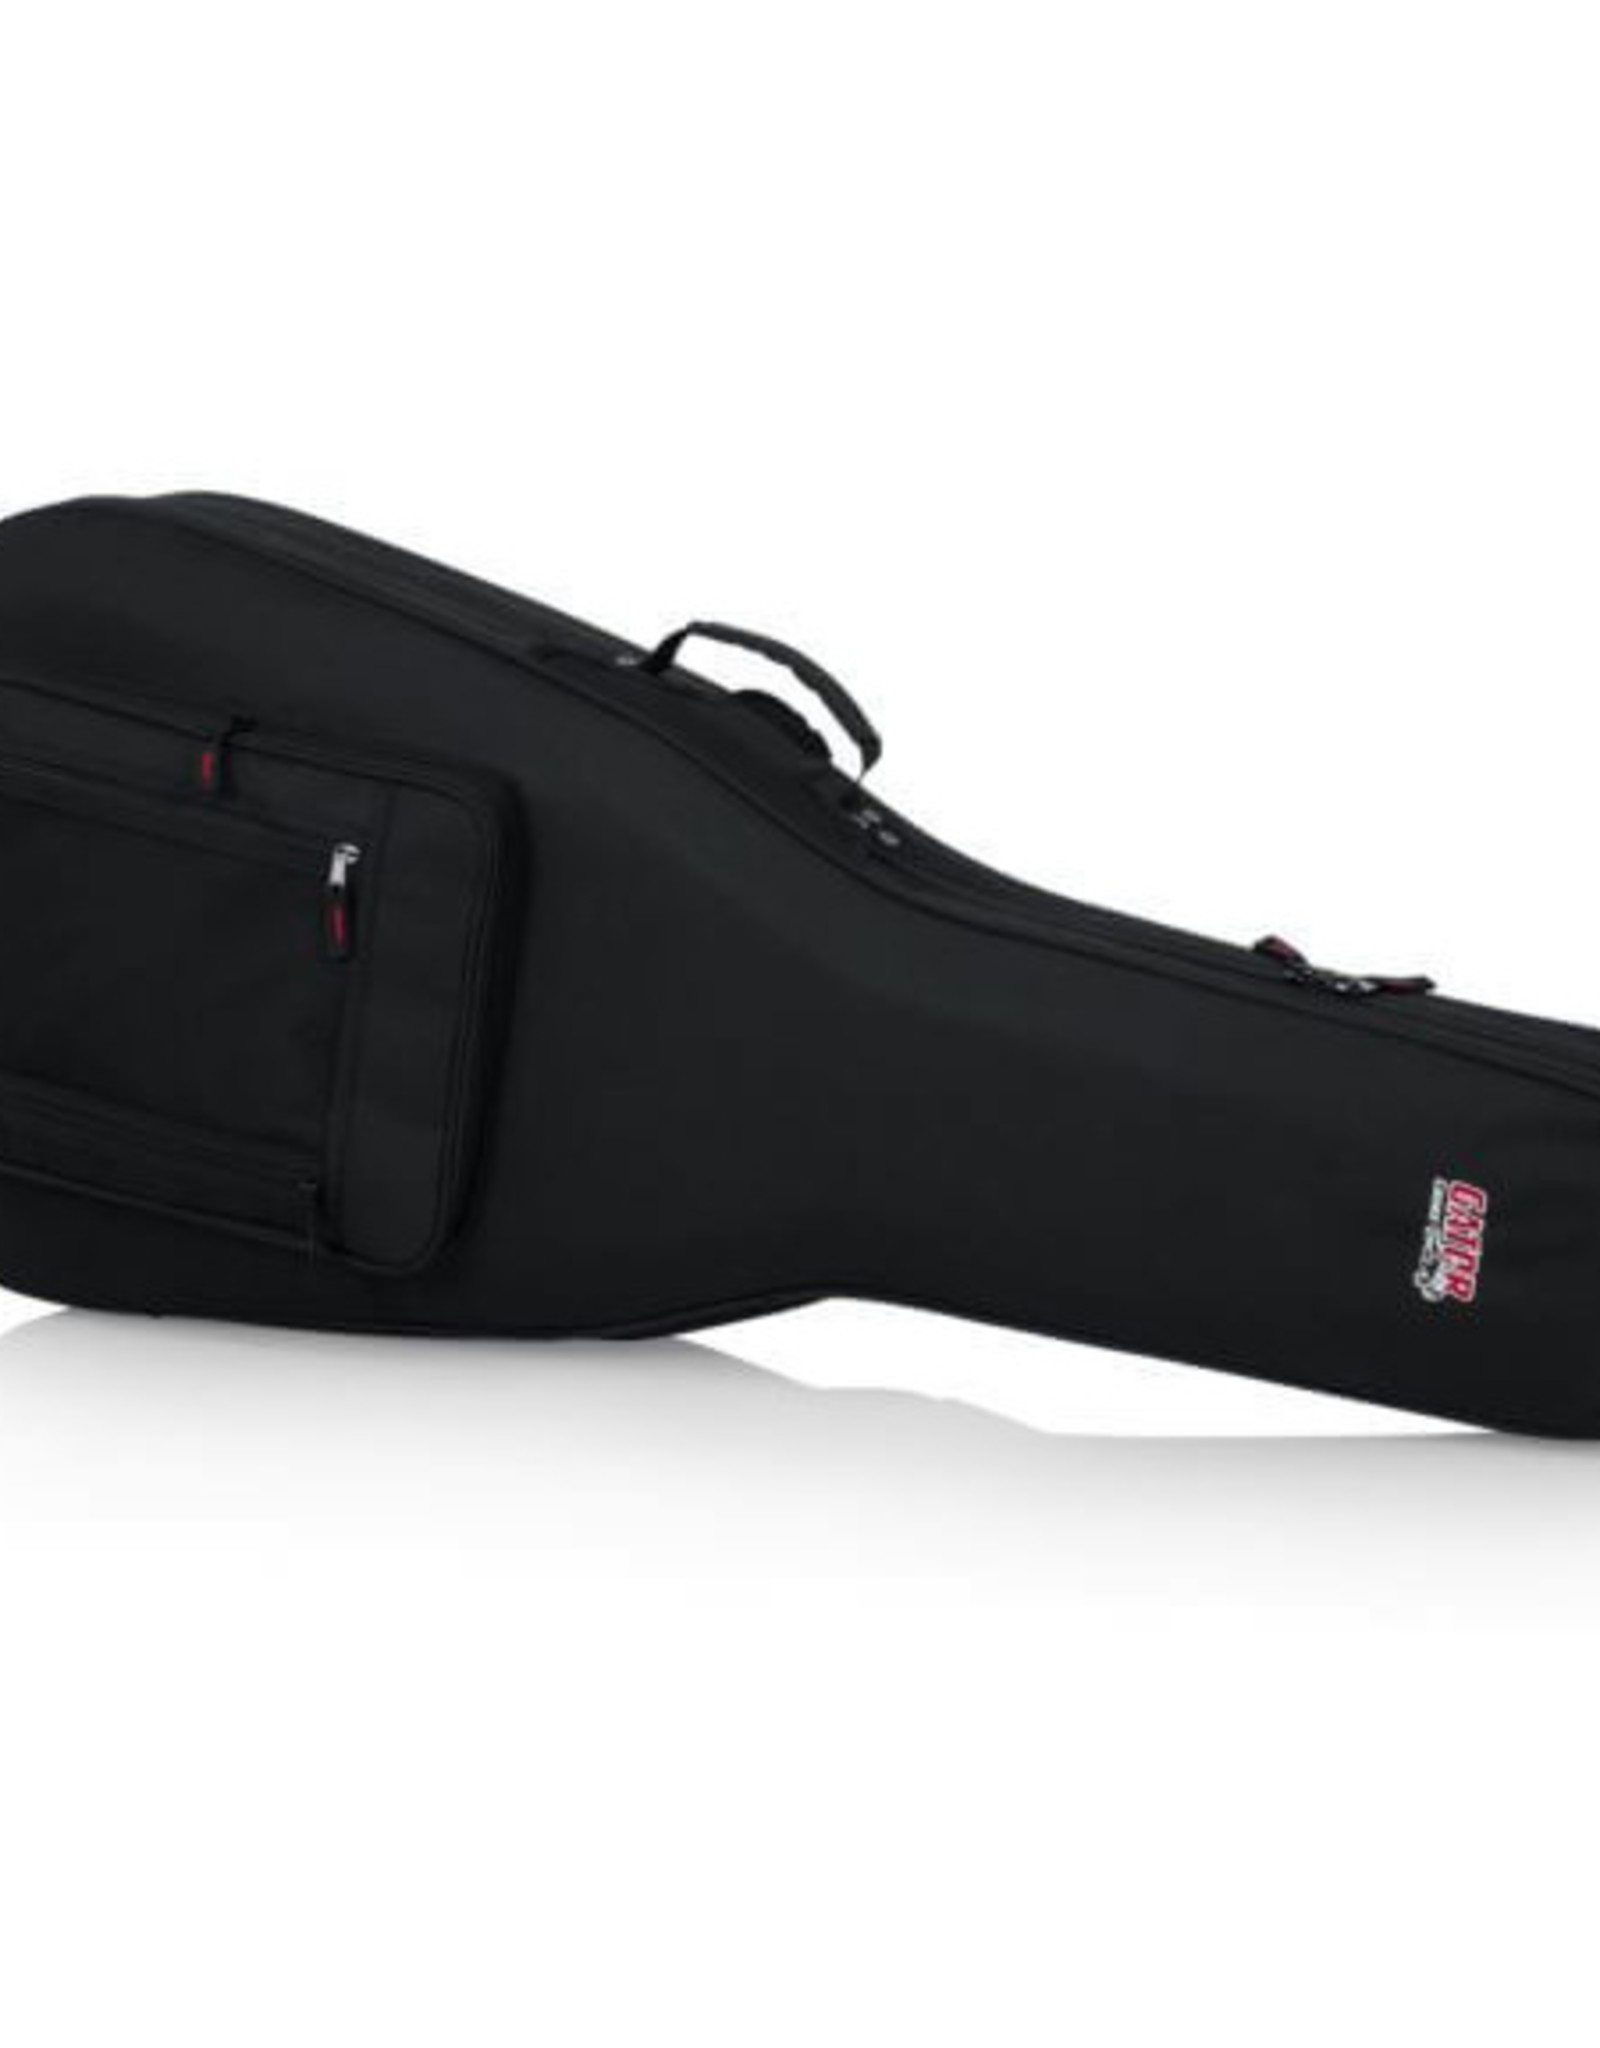 Gator Gator Rigid EPS Polyfoam Lightweight Case for 12-String Dreadnought Guitars